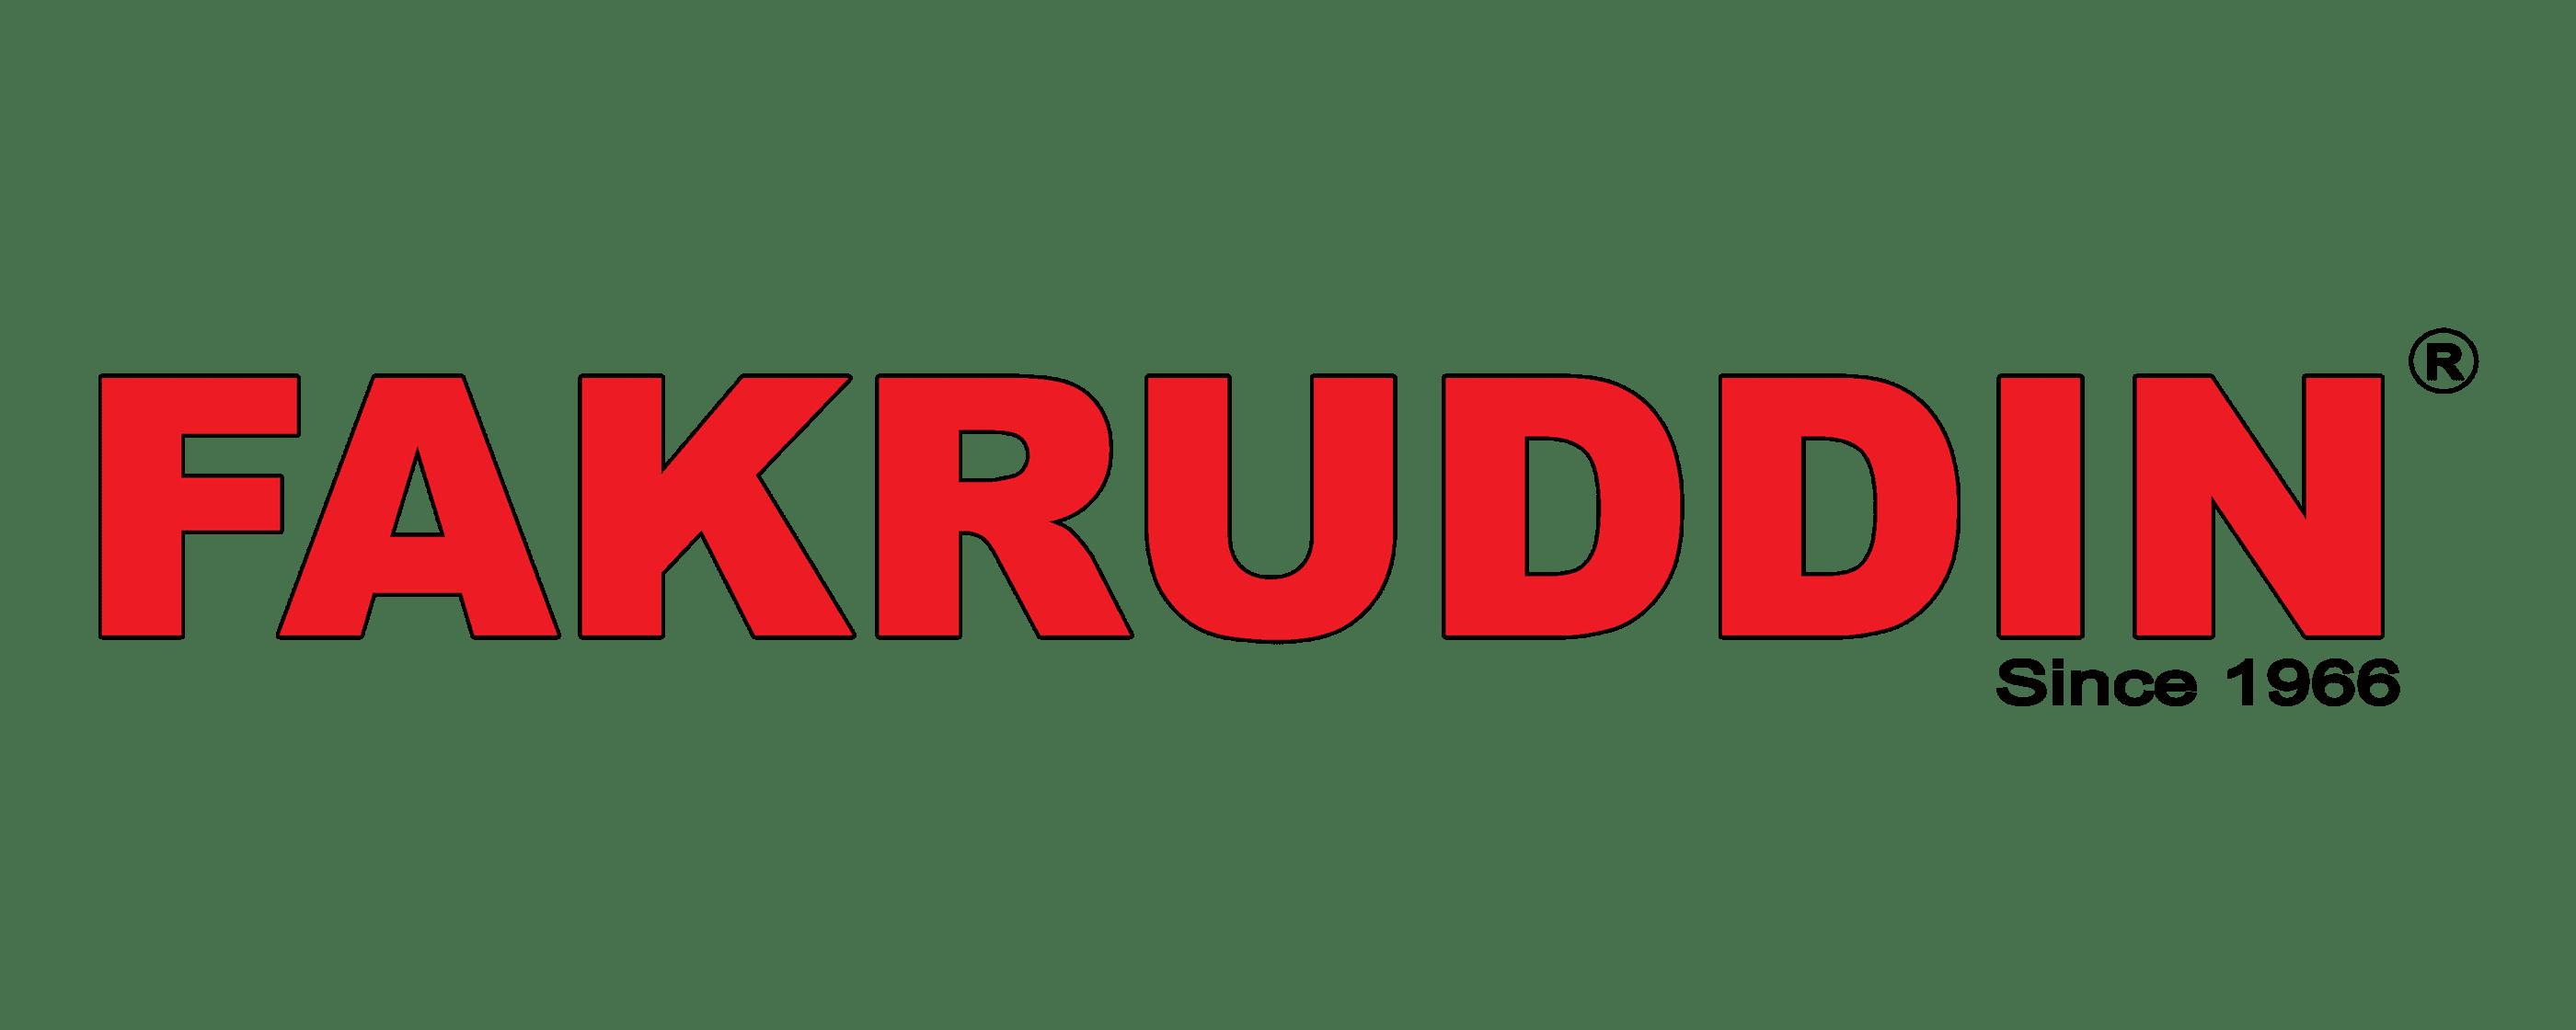 Fakruddin Foods Limited